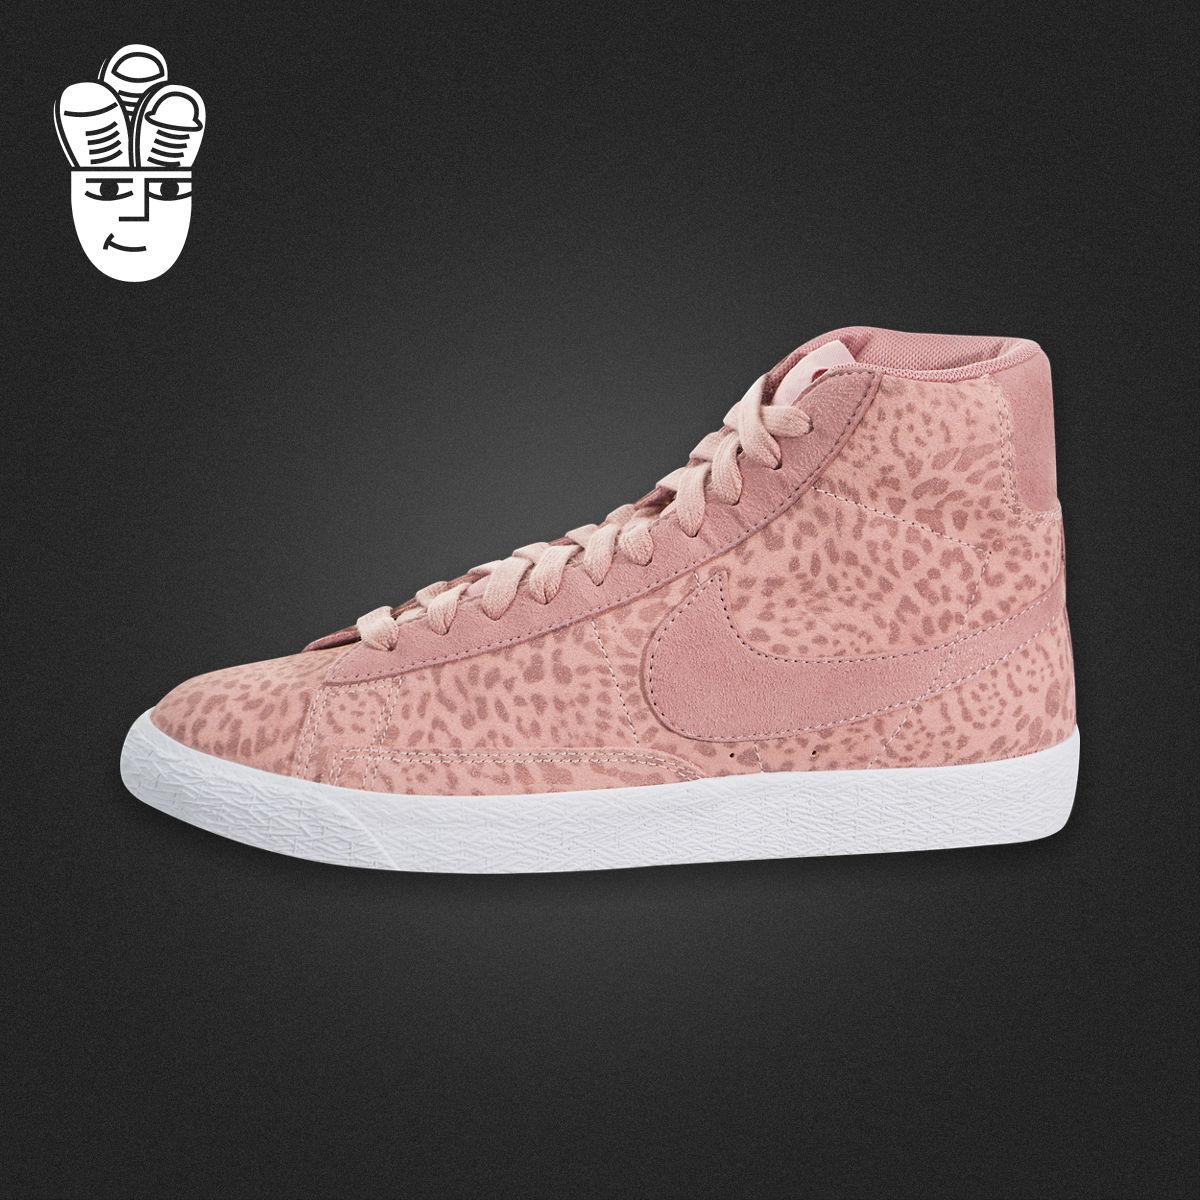 Nike Blazer Mid SE 耐克男鞋女鞋GS 复古休闲鞋 运动鞋